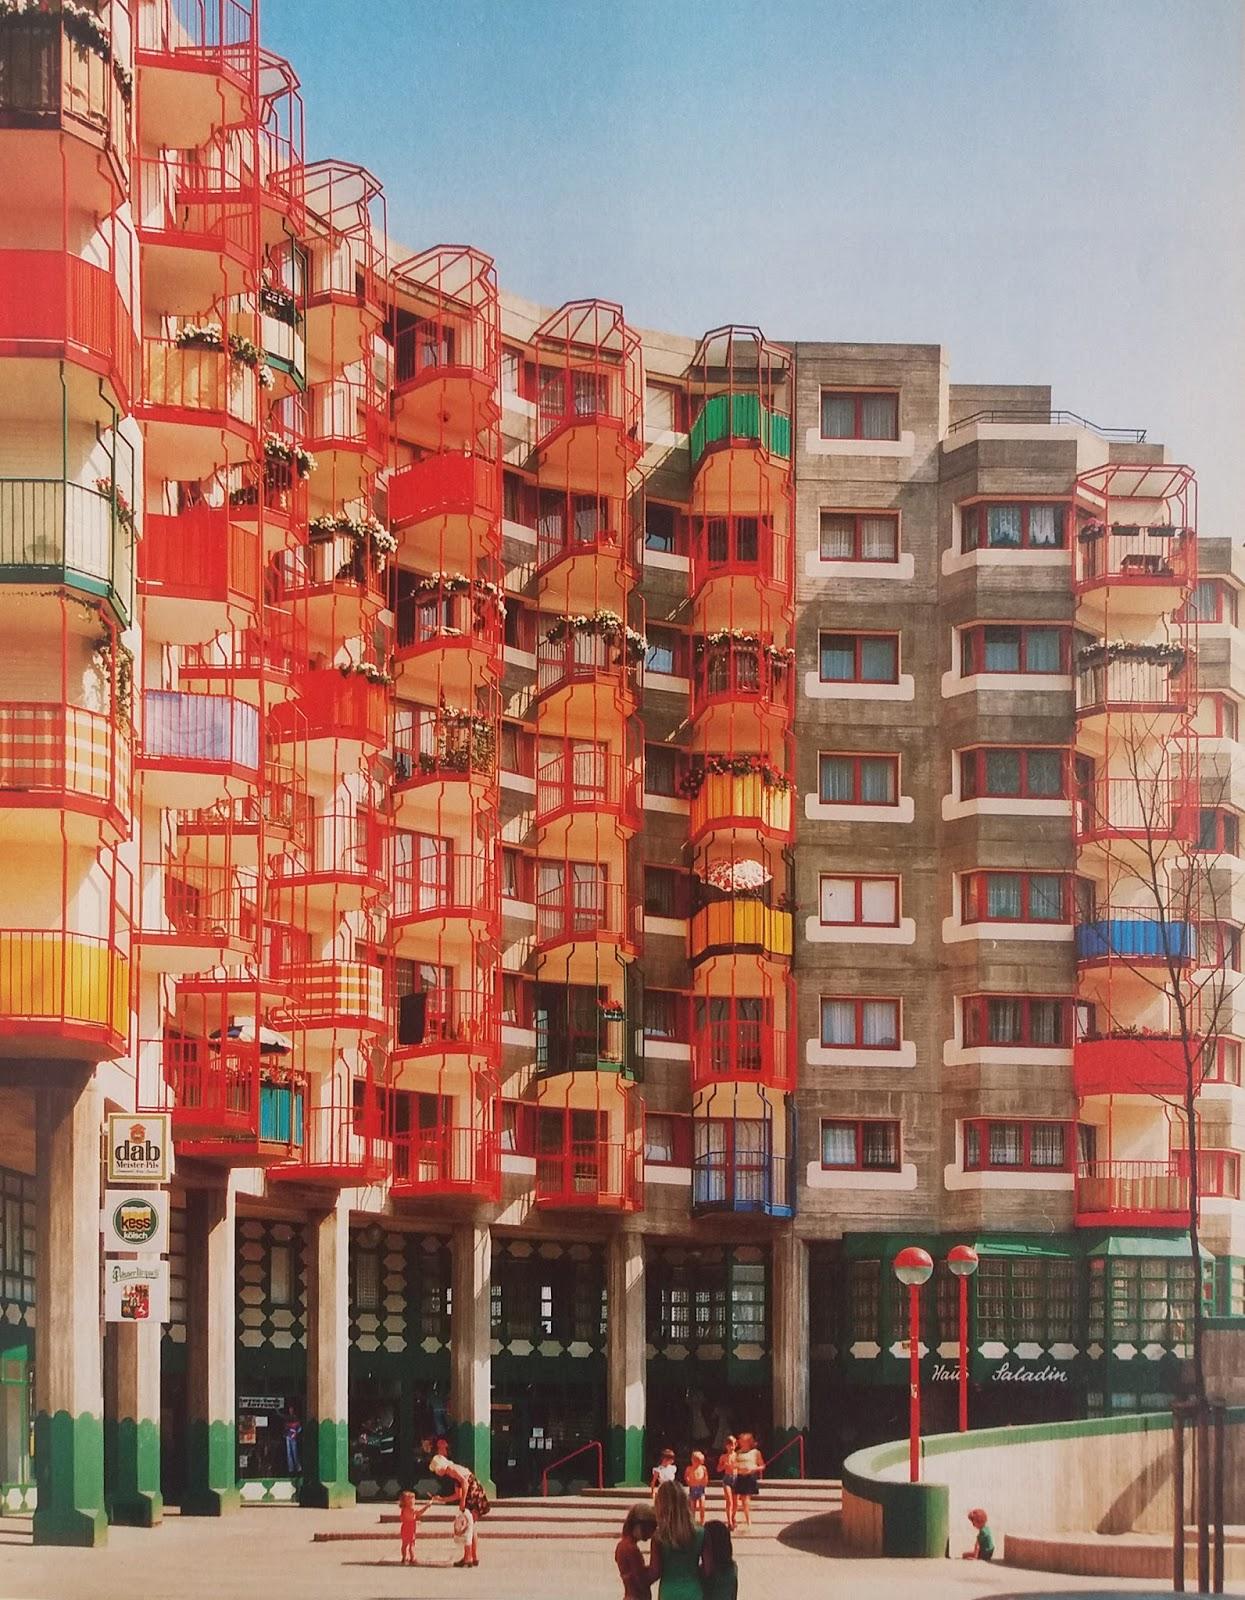 Chorweiler Housing Estate